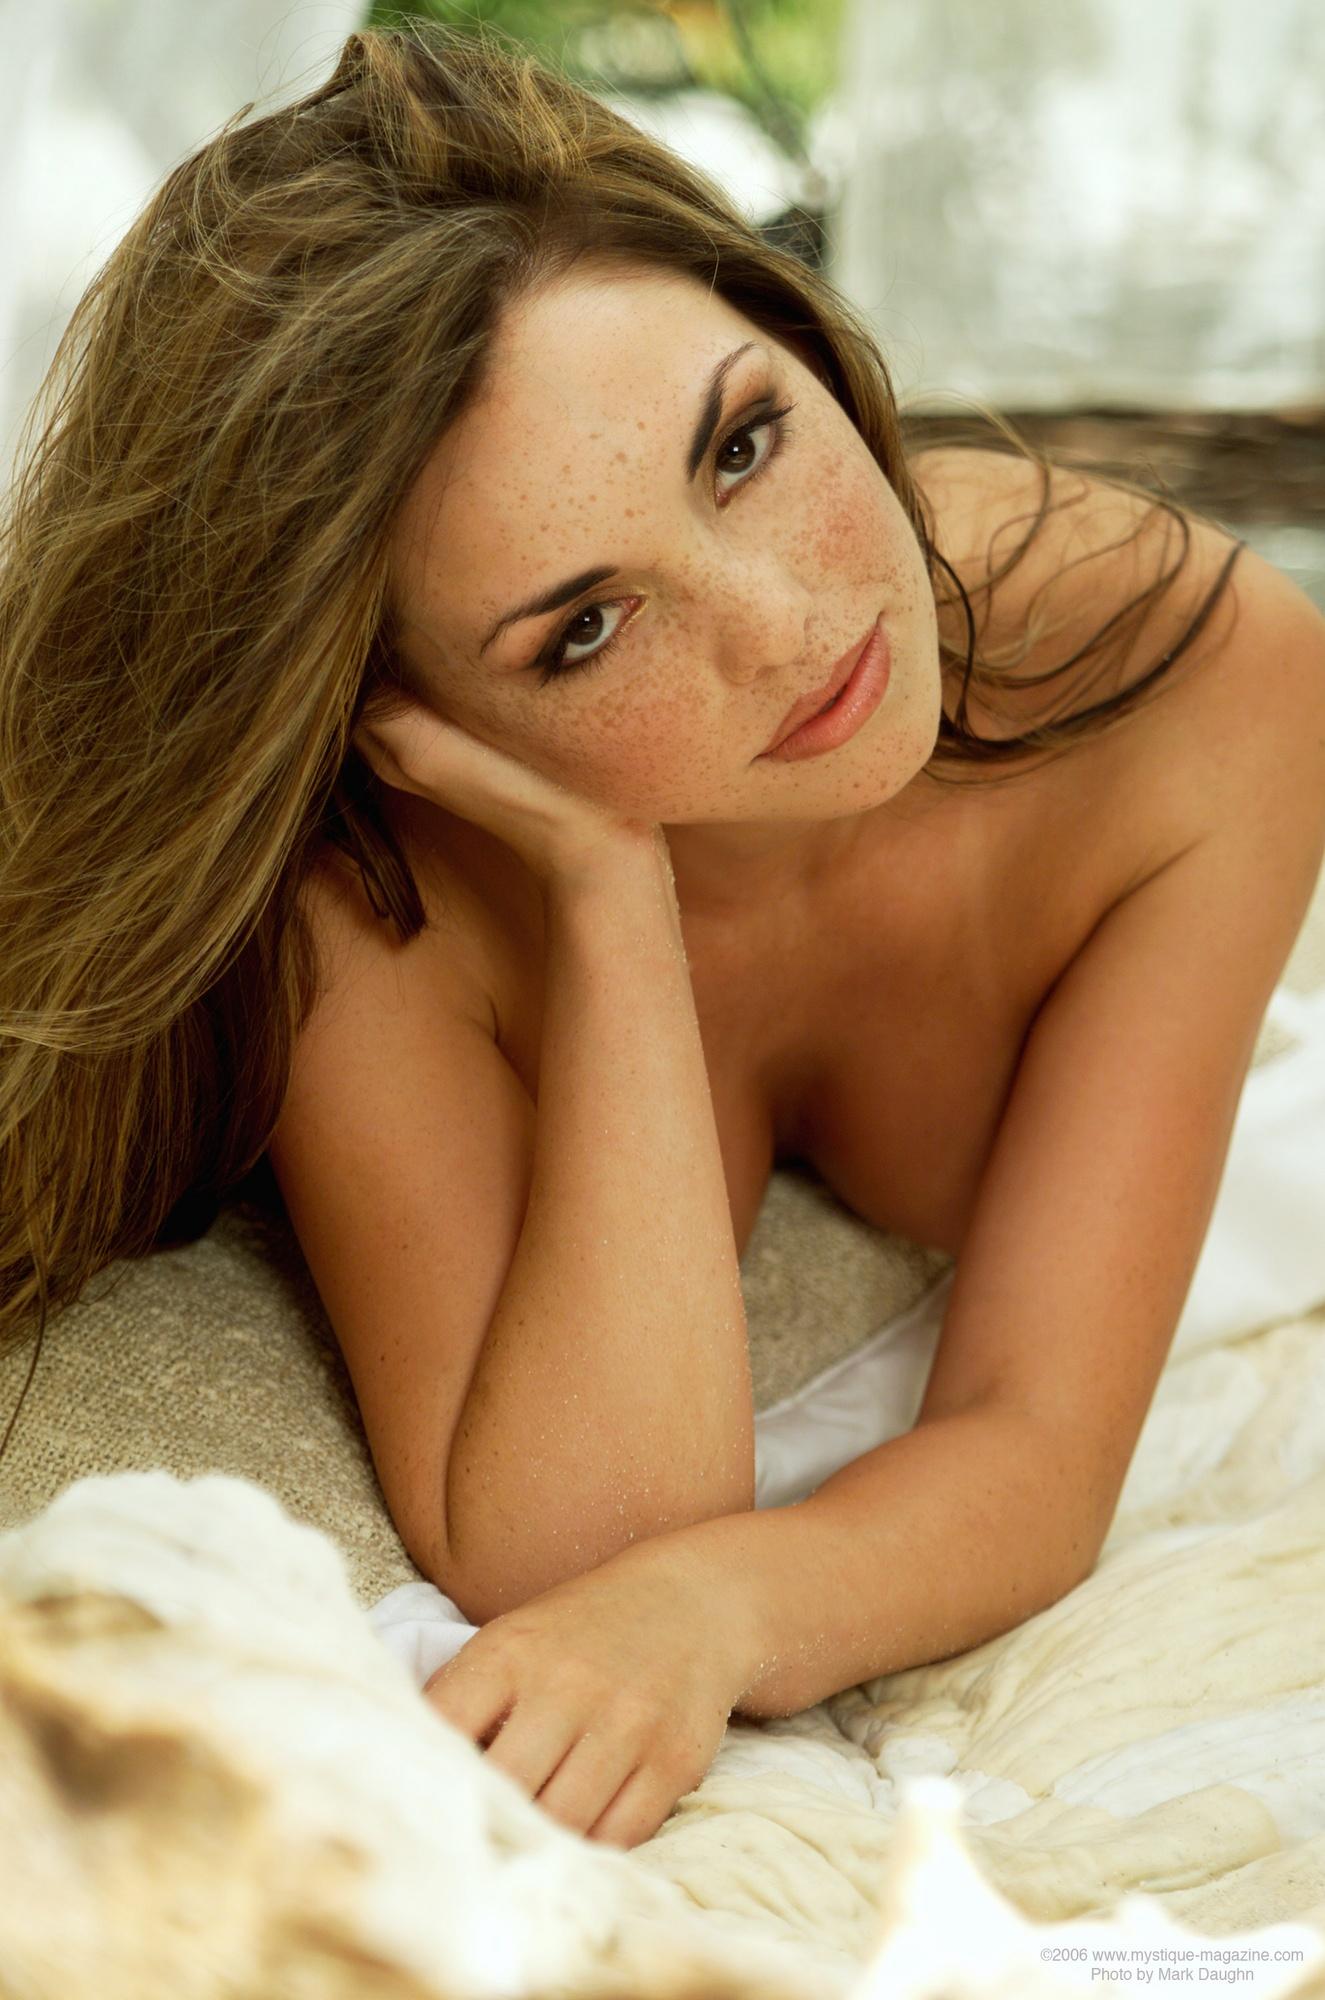 danielle-gamba-boobs-white-fishnet-nude-mystique-14